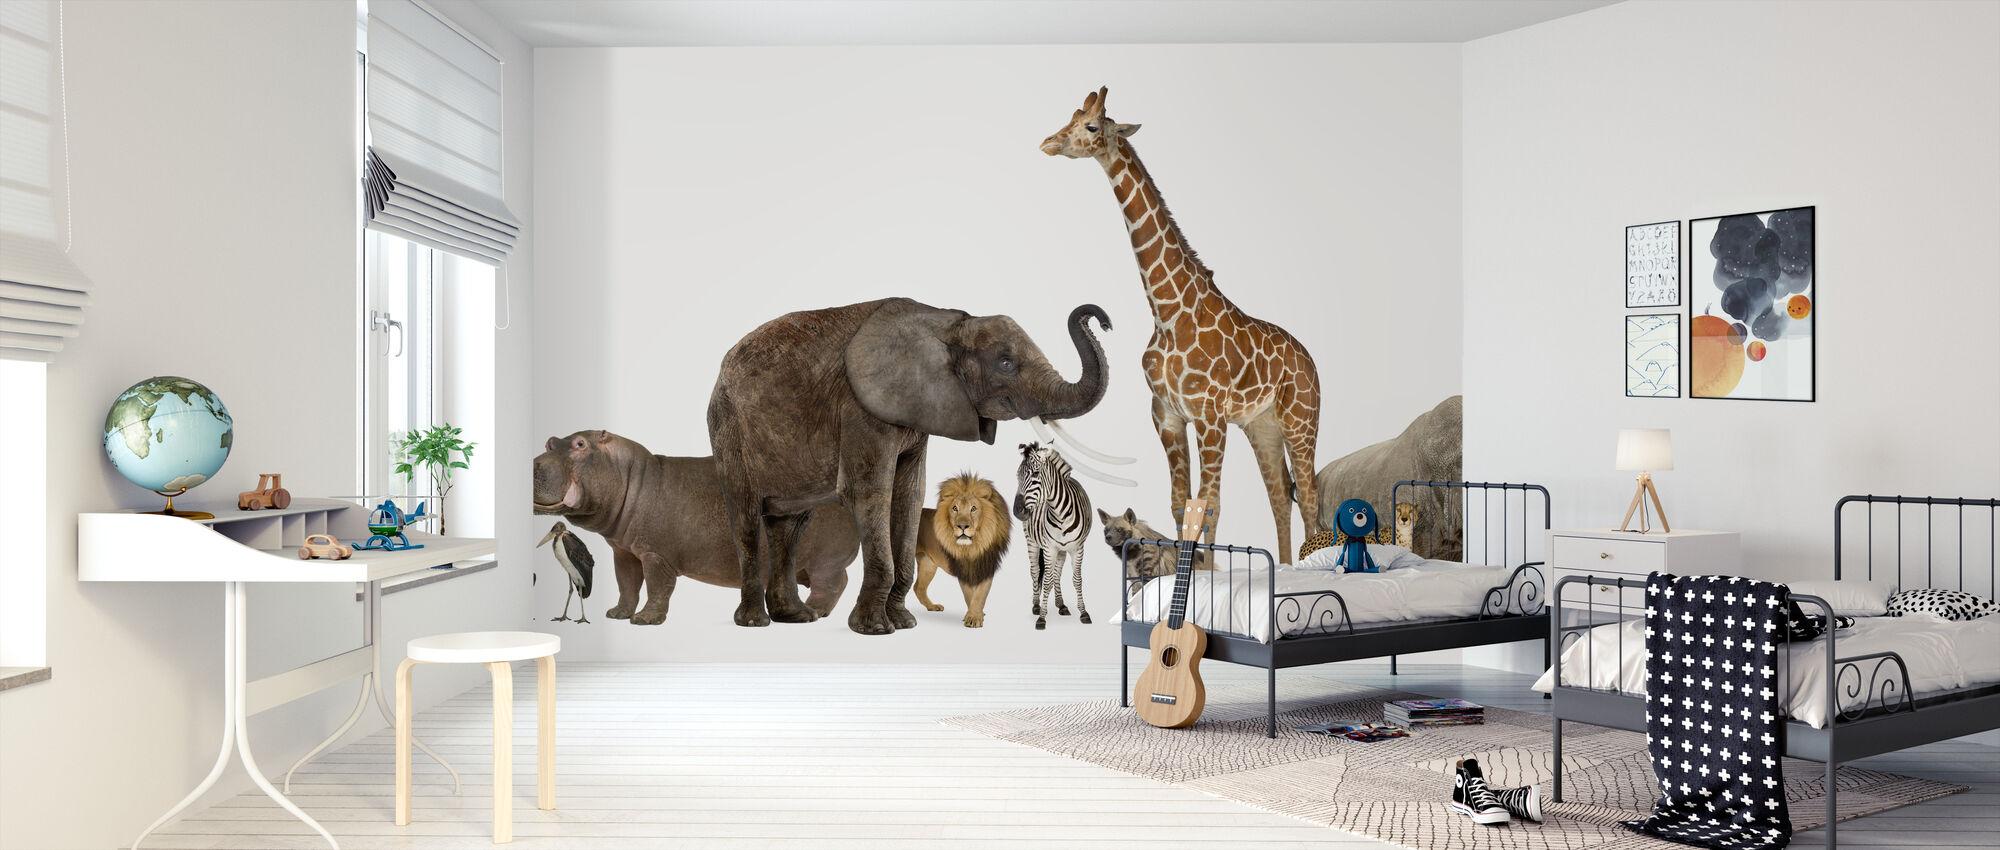 Collection of Wildlife Animals - Wallpaper - Kids Room